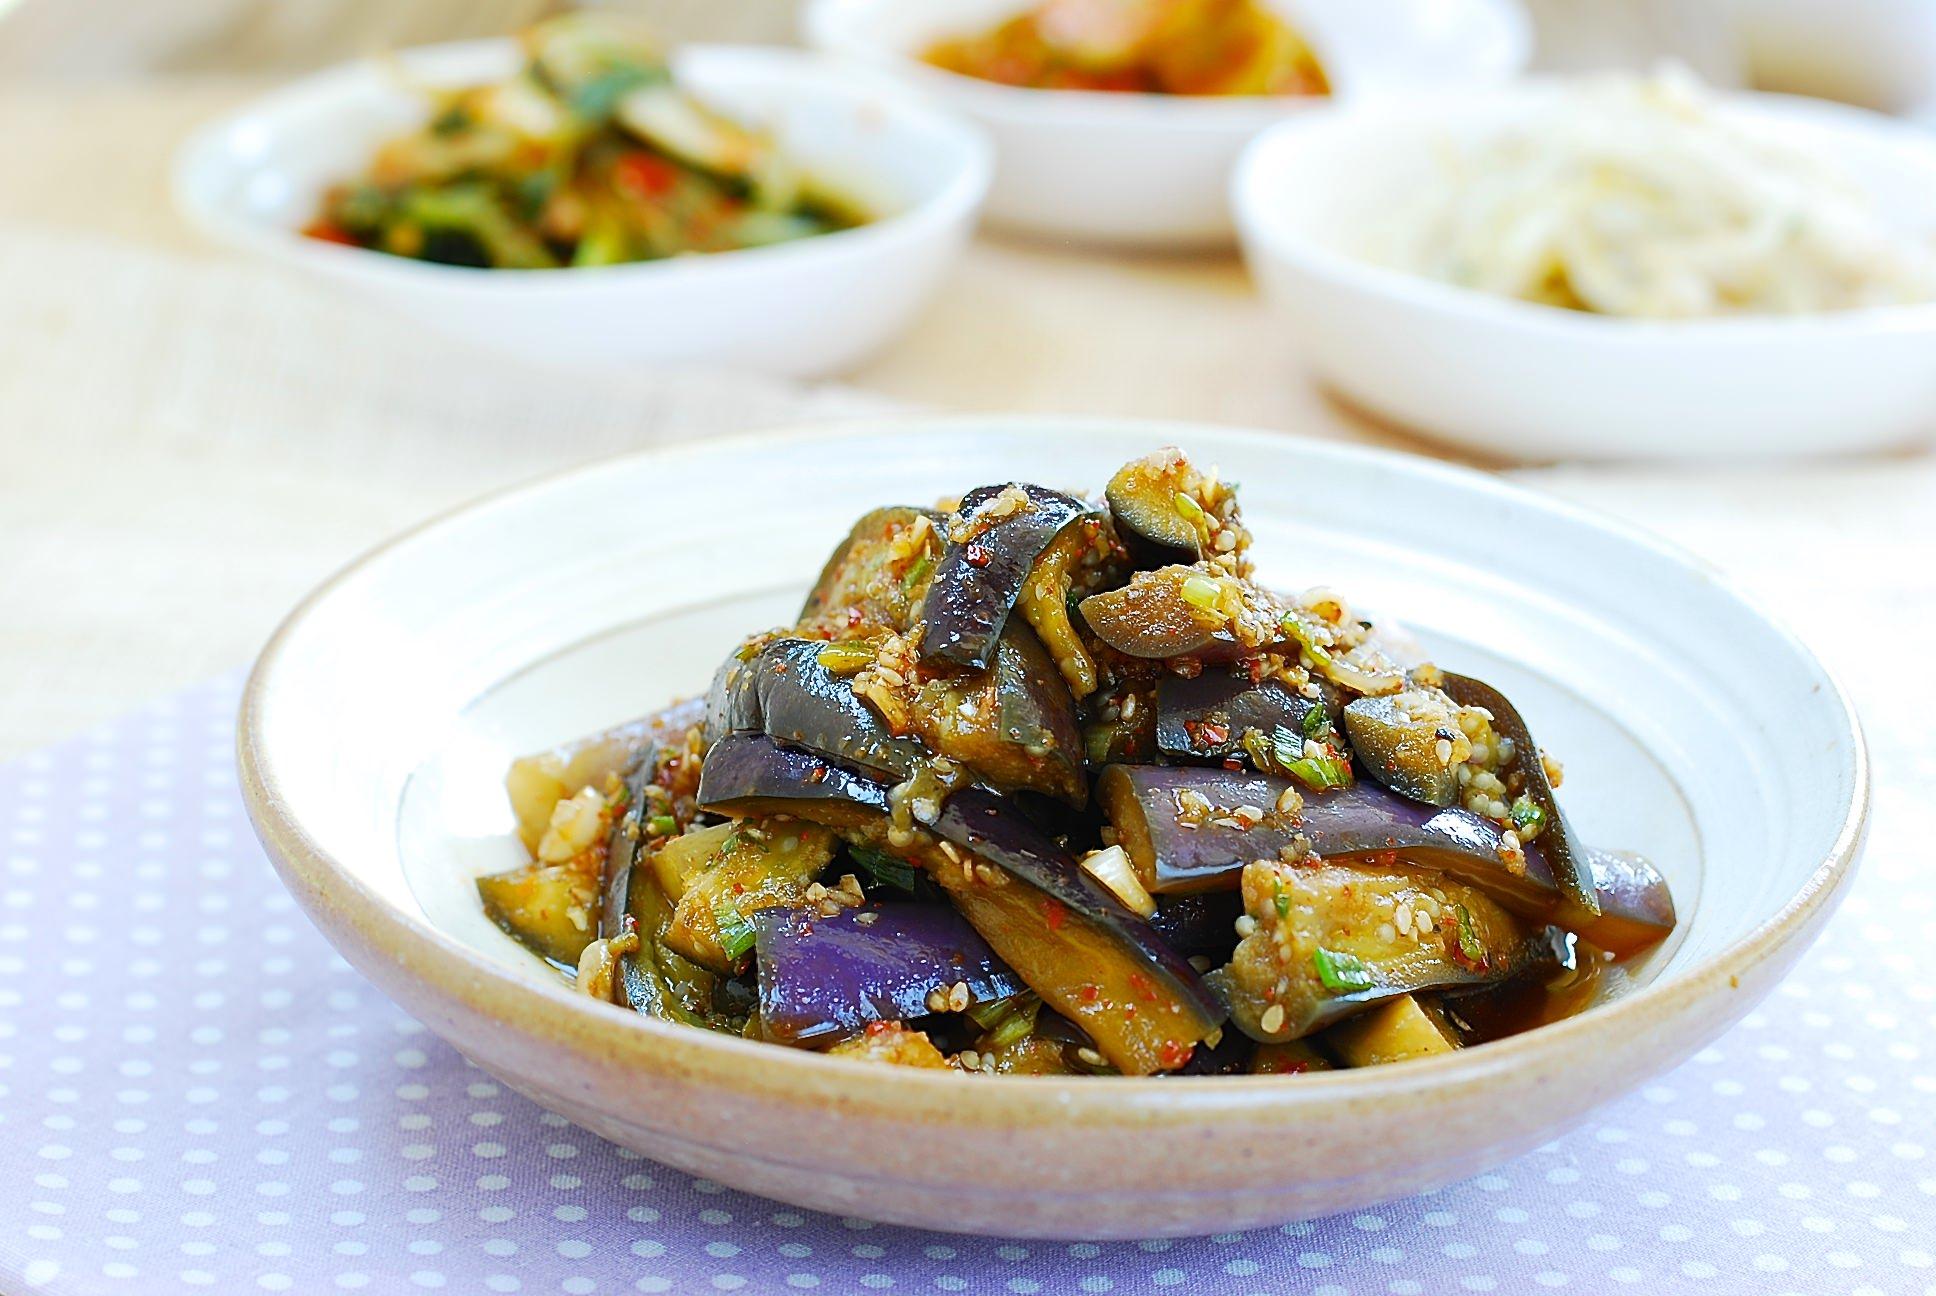 Gaji namul steamed eggplant side dish korean bapsang gaji namul eggplant side dish forumfinder Gallery